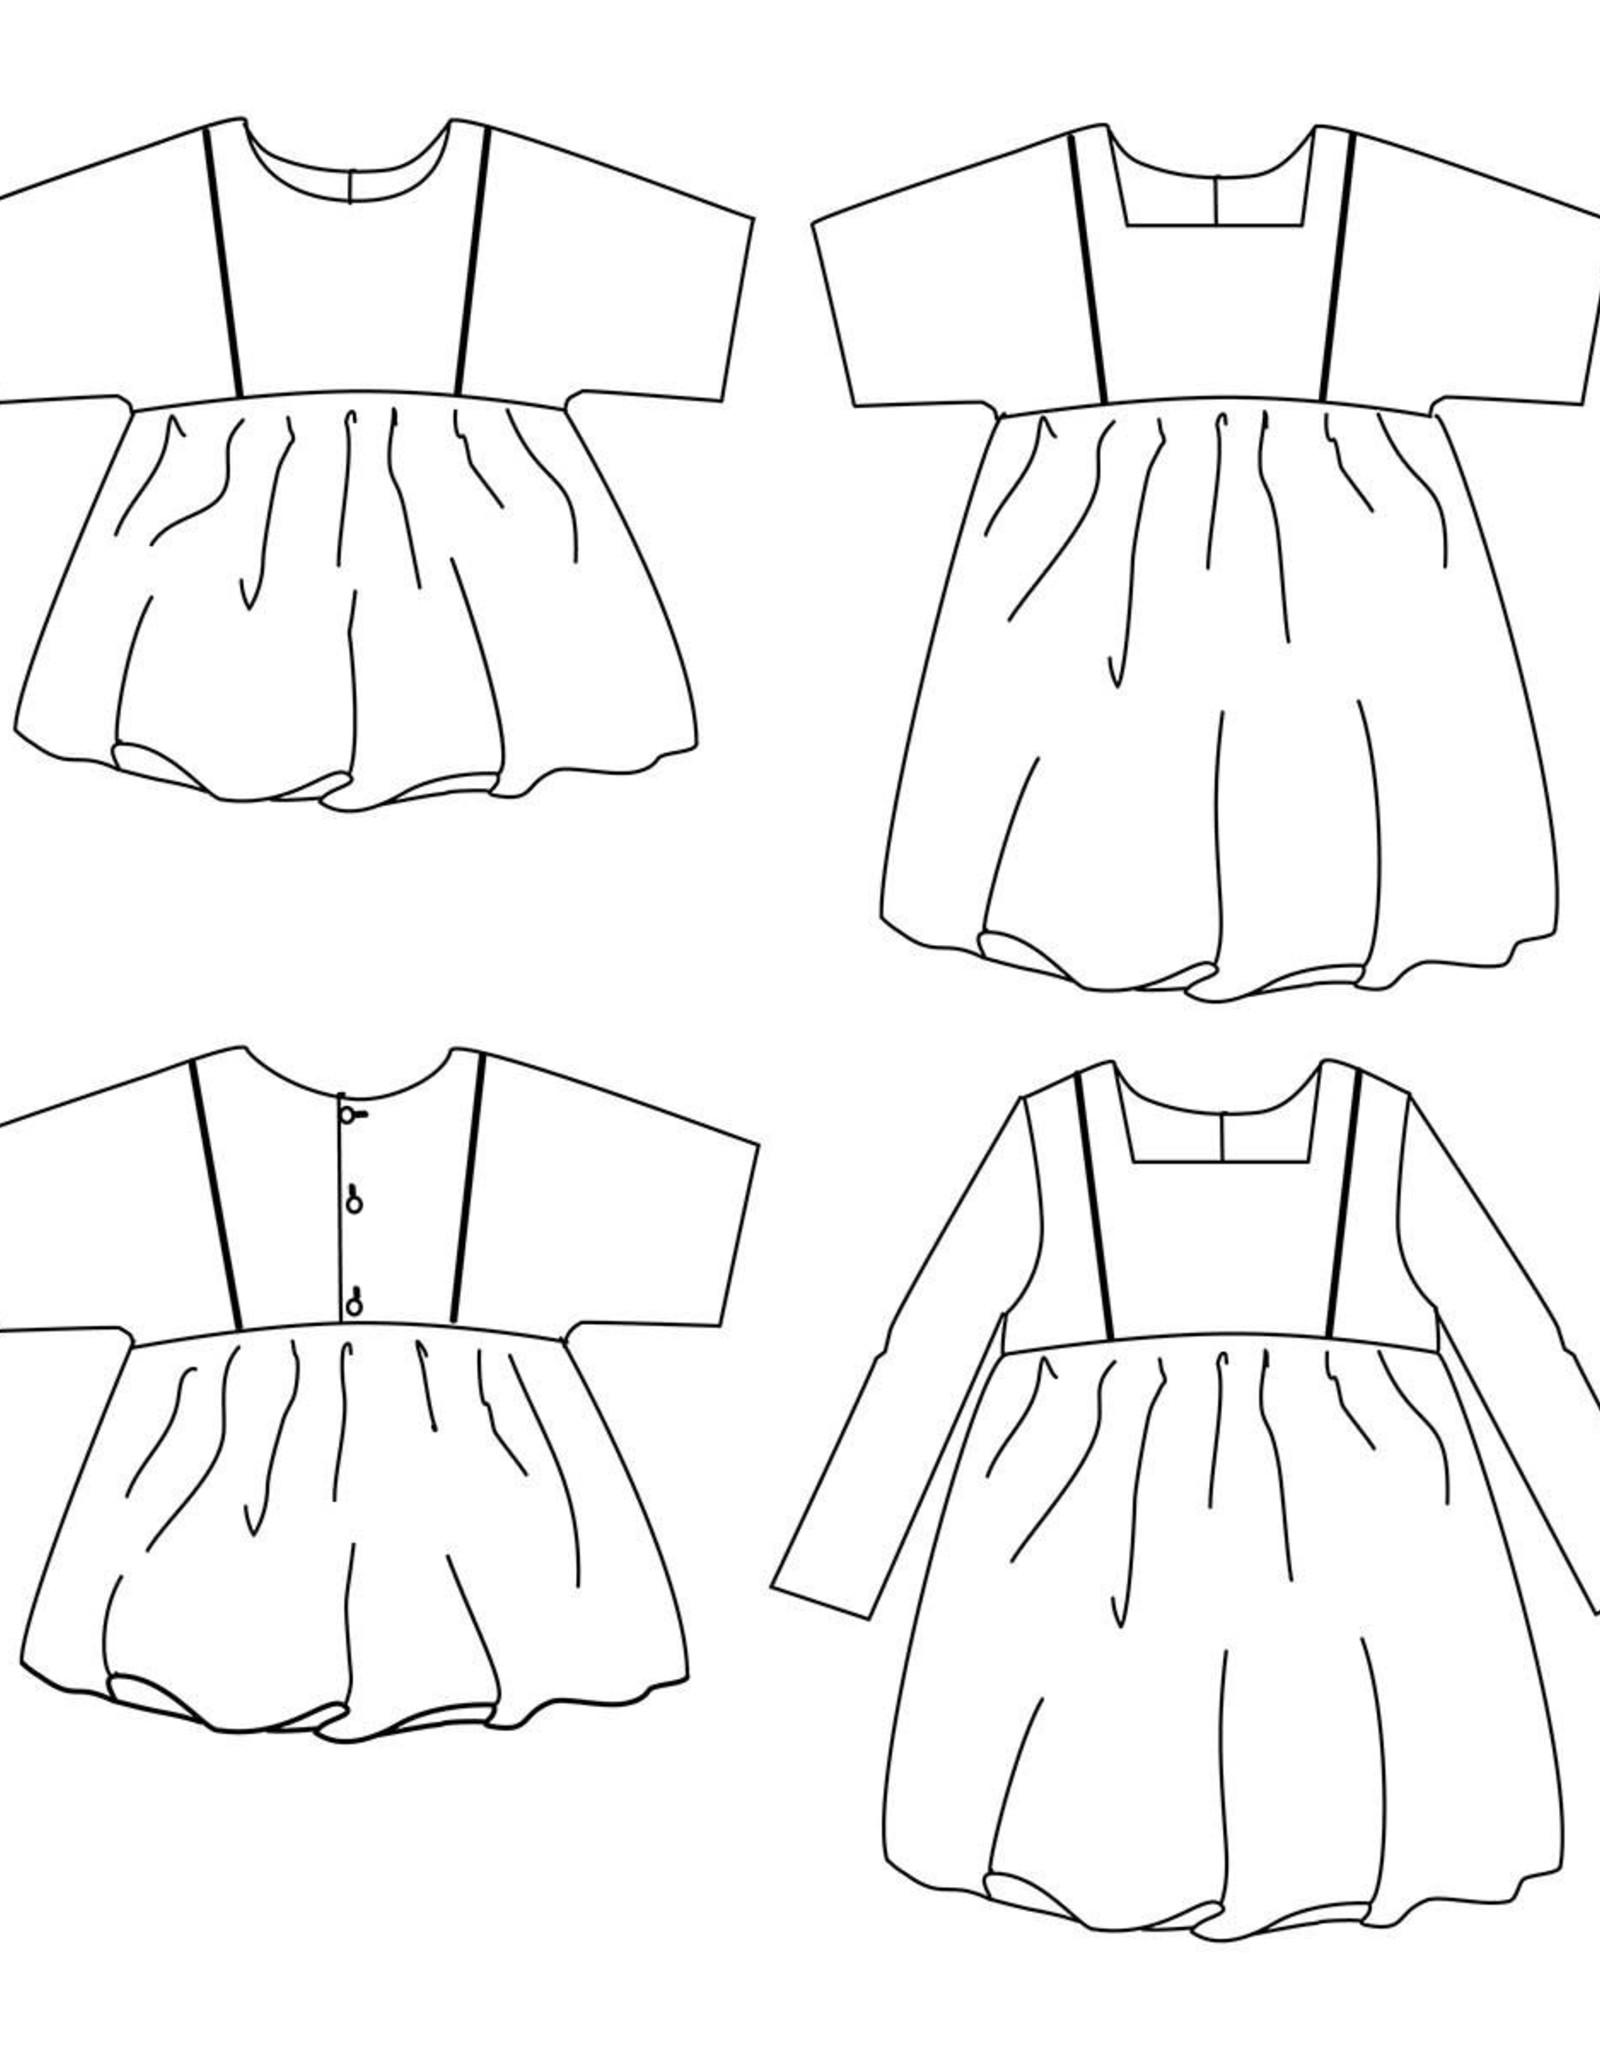 Ikatee Sakura kids blouse/dress